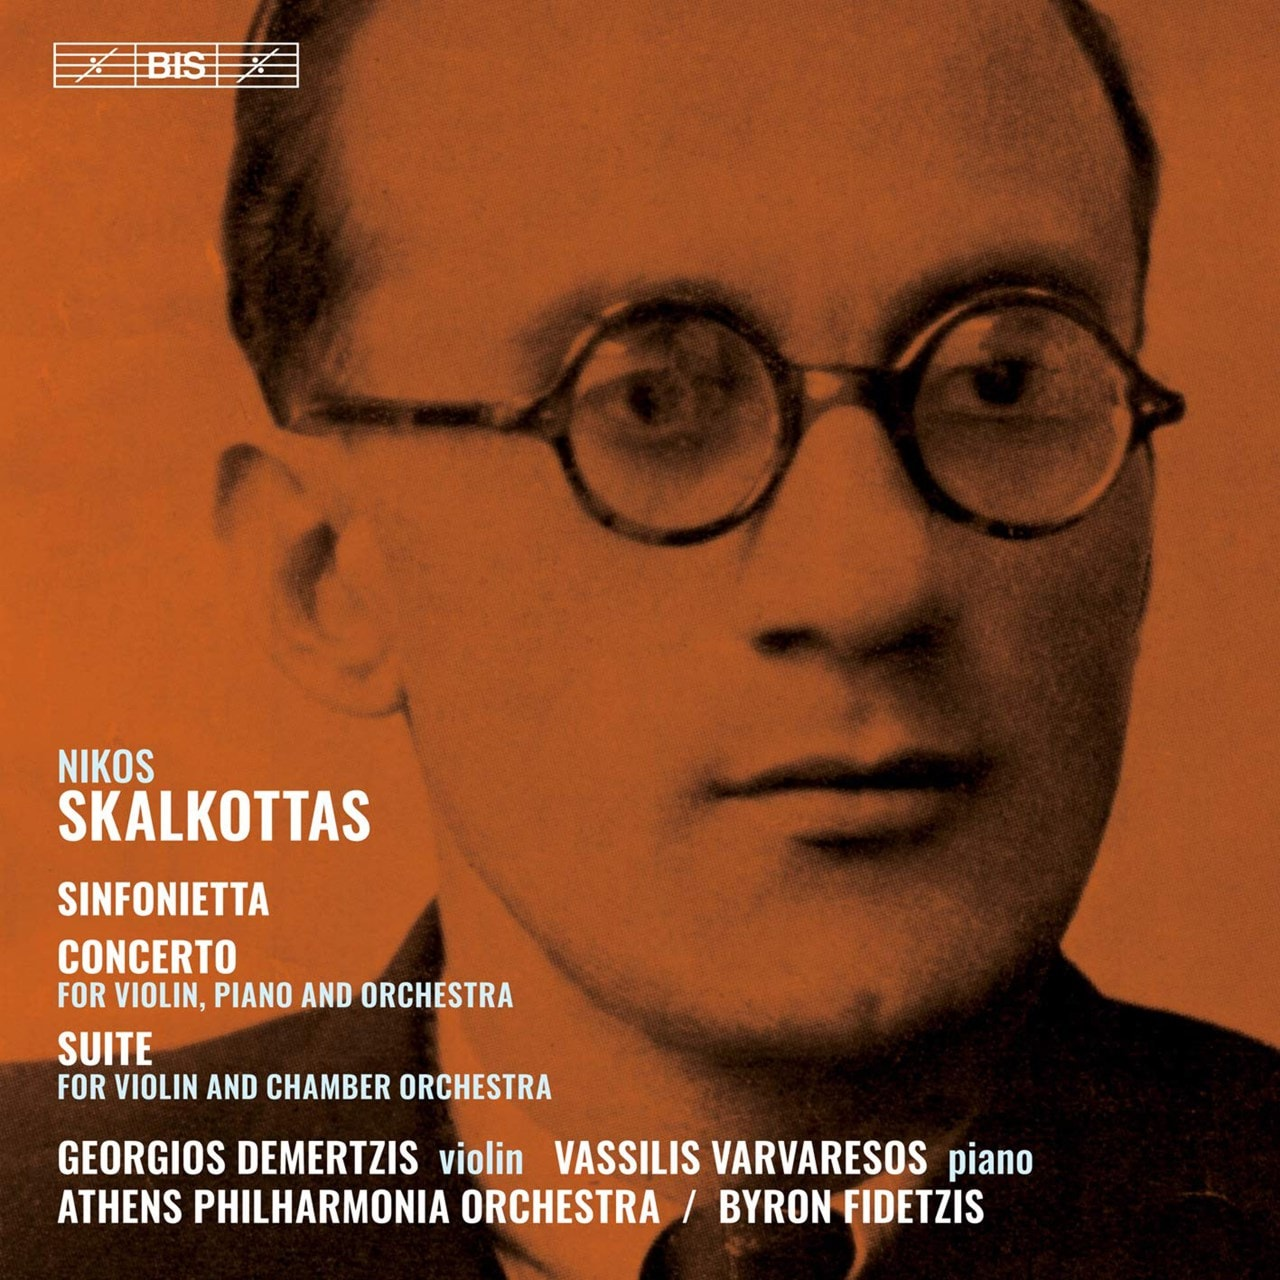 Nikos Skalkottas: Sinfonietta/Concerto/Suite - 1